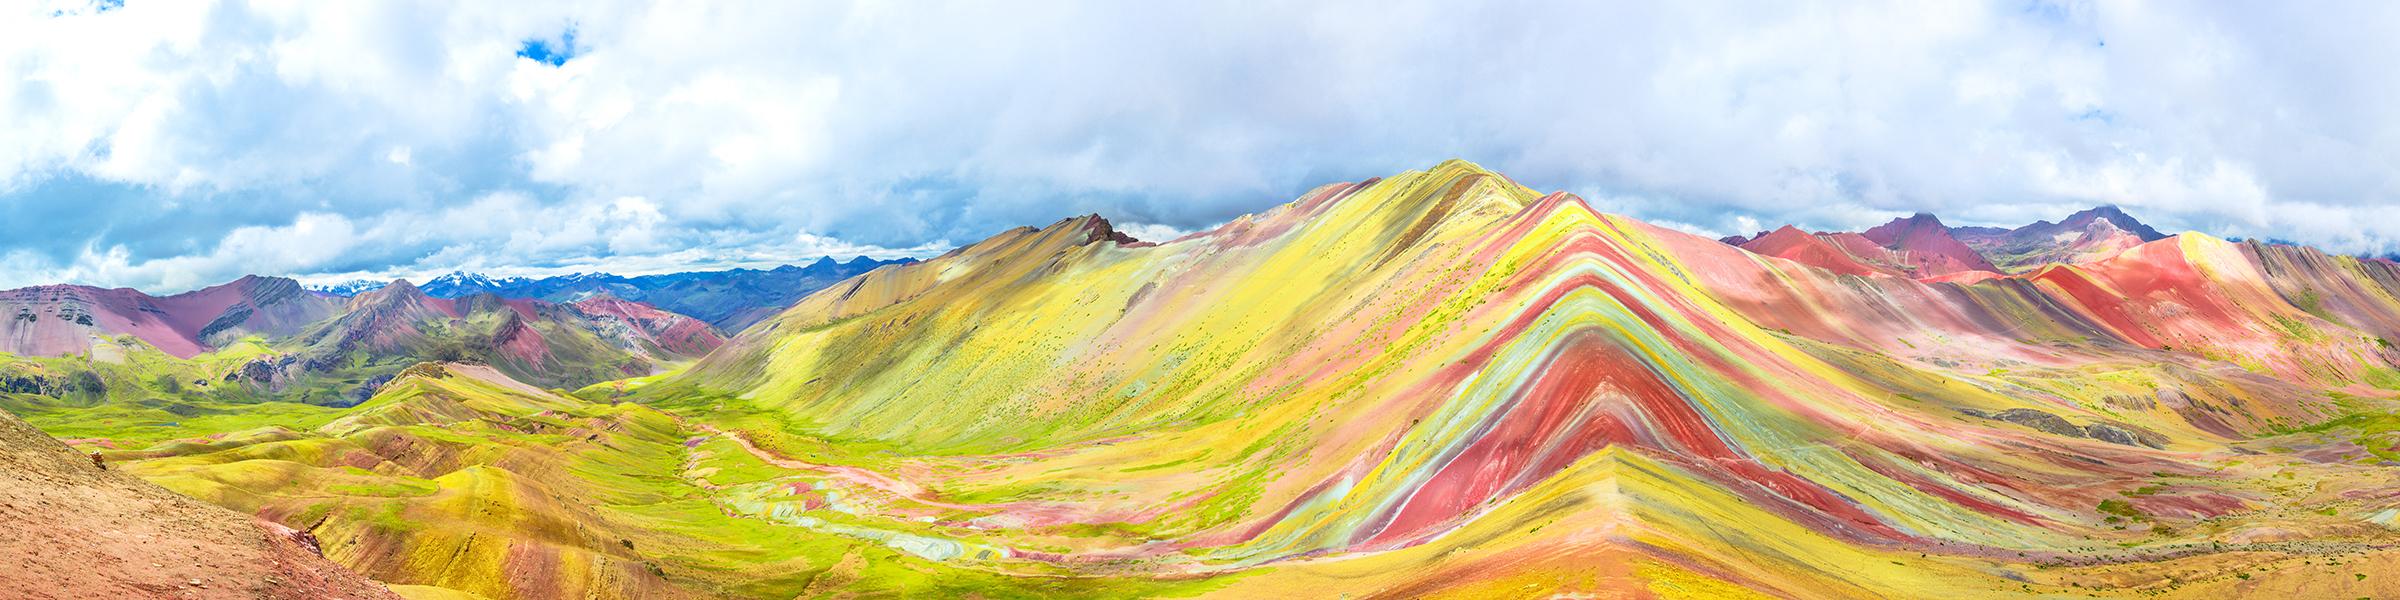 Peru Vinicunca Rainbow Mountain